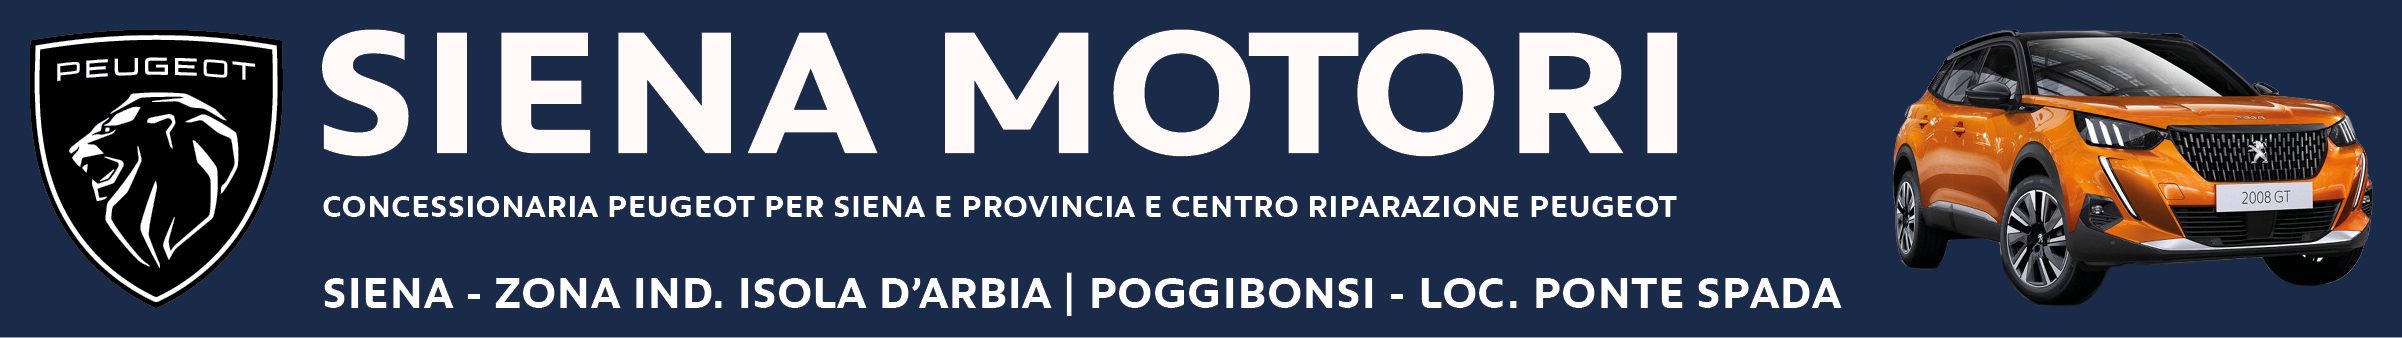 Siena Motori Peugeot